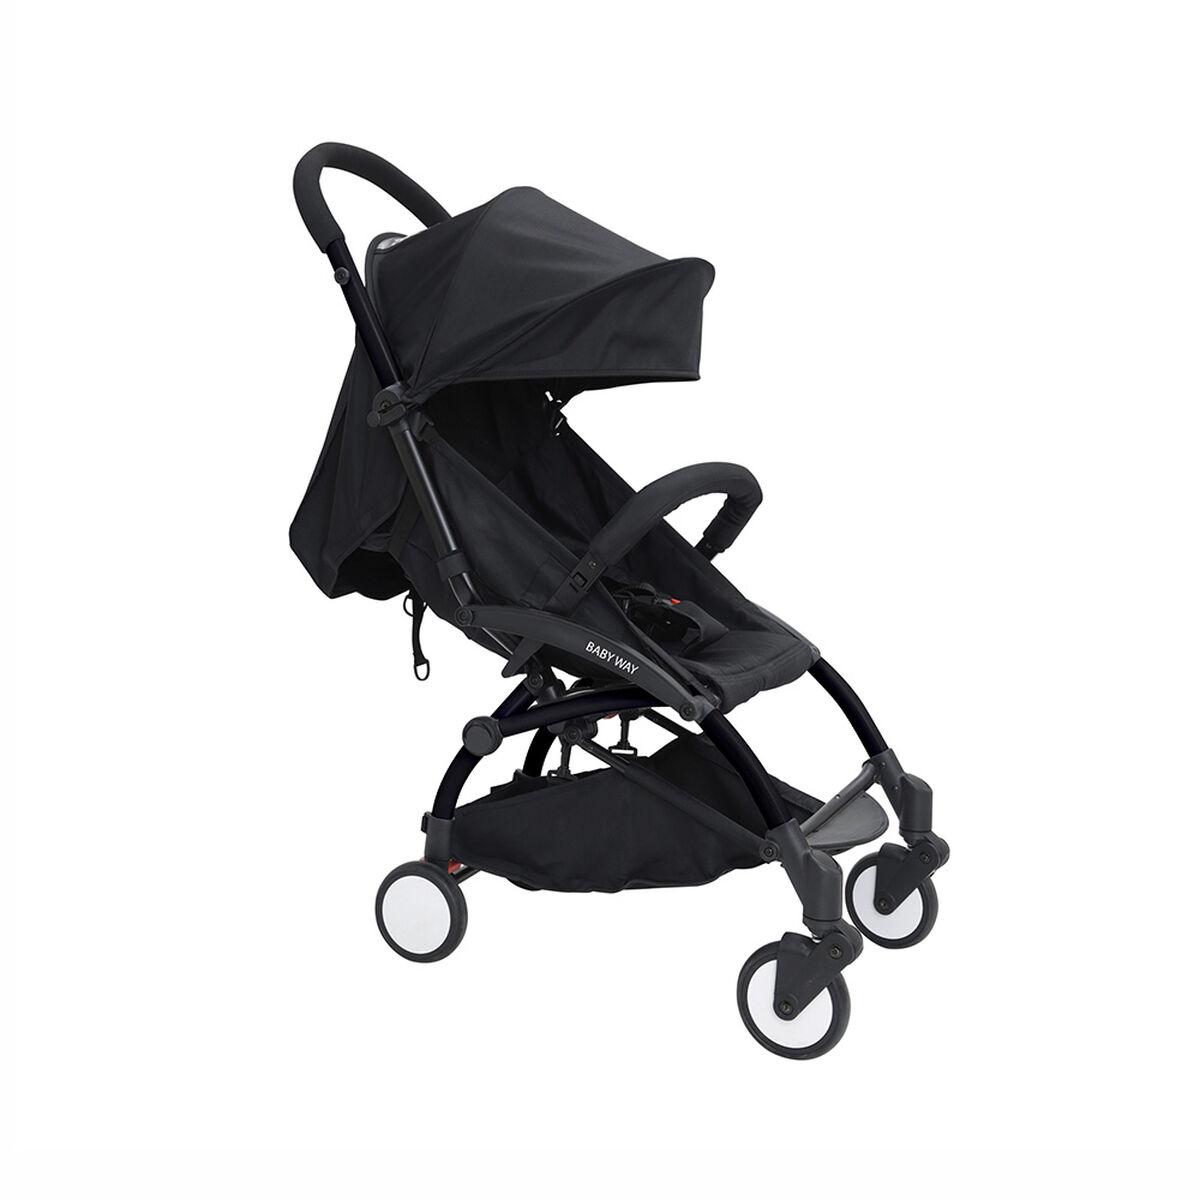 Coche Paseo Negro Baby Way BW-207N17